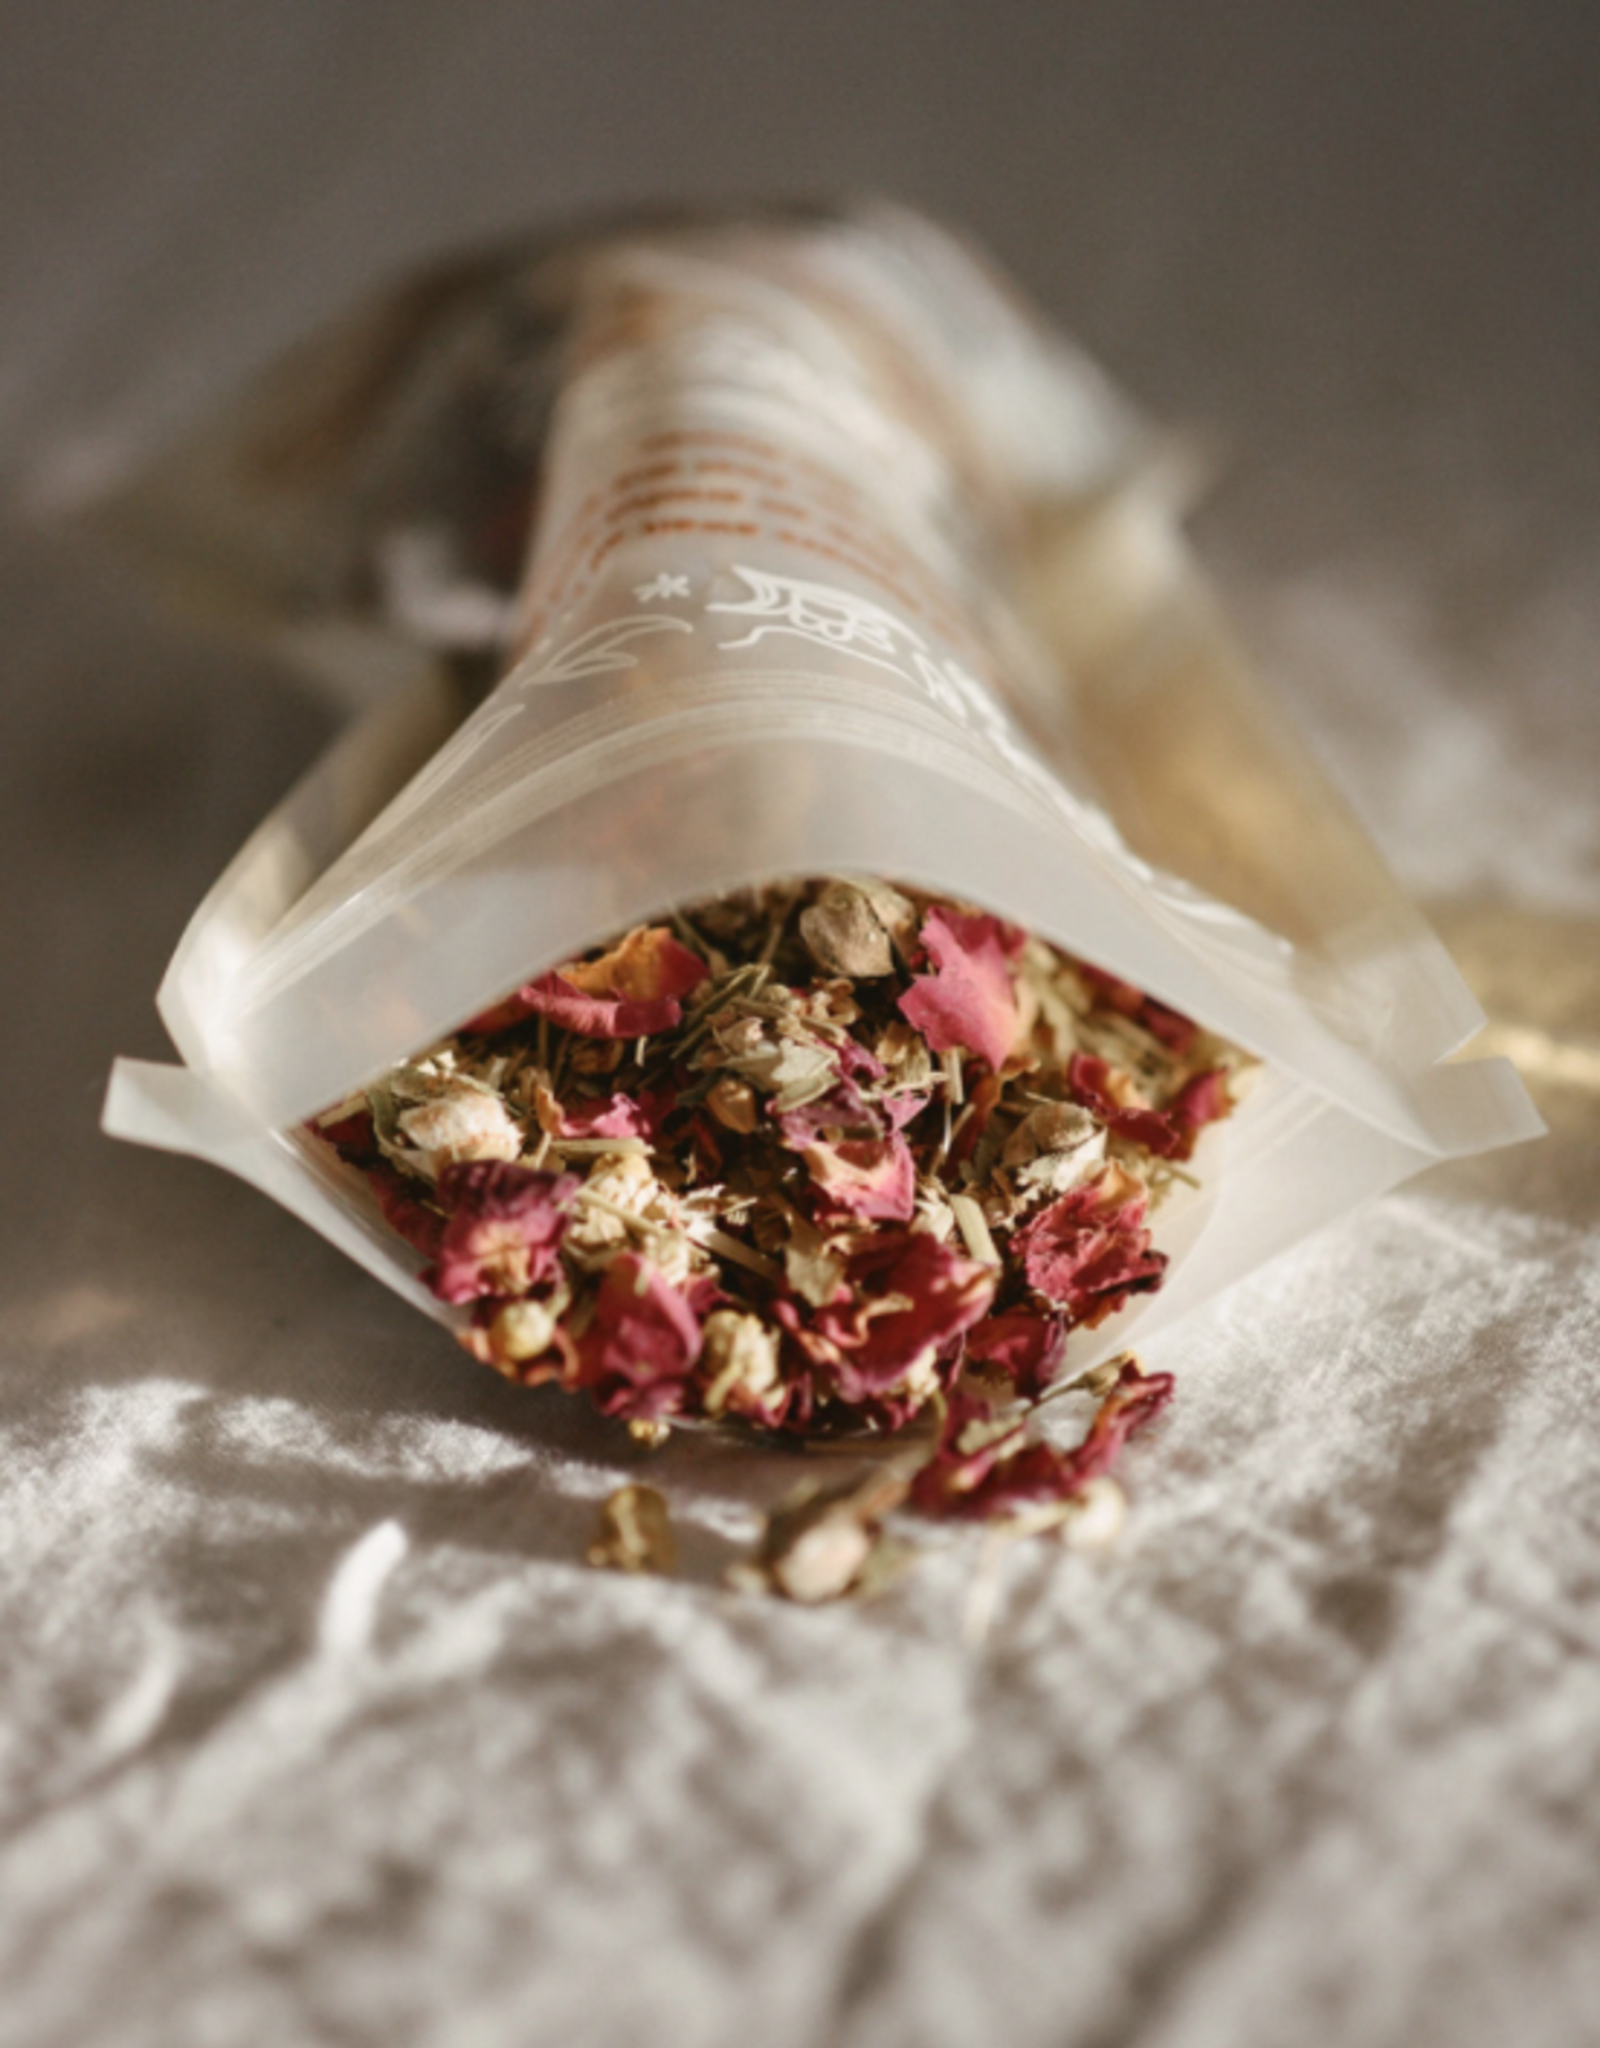 Wooden Spoon Herbs Country Women Tea